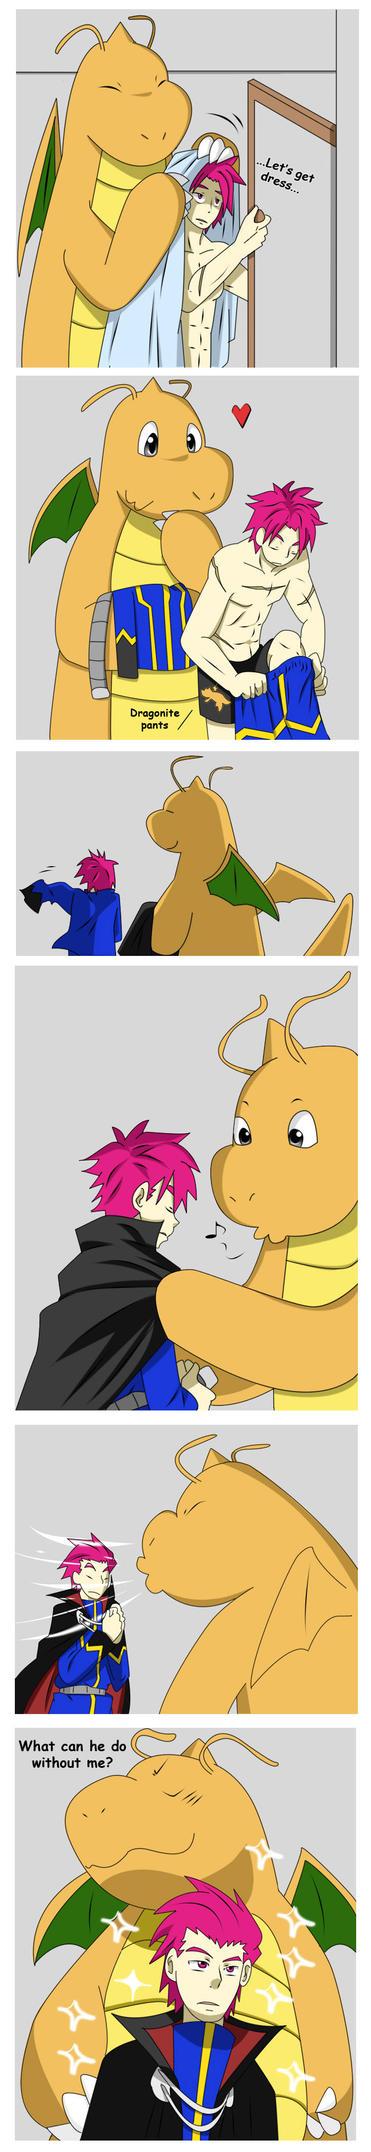 Helpful friend by Aosuka